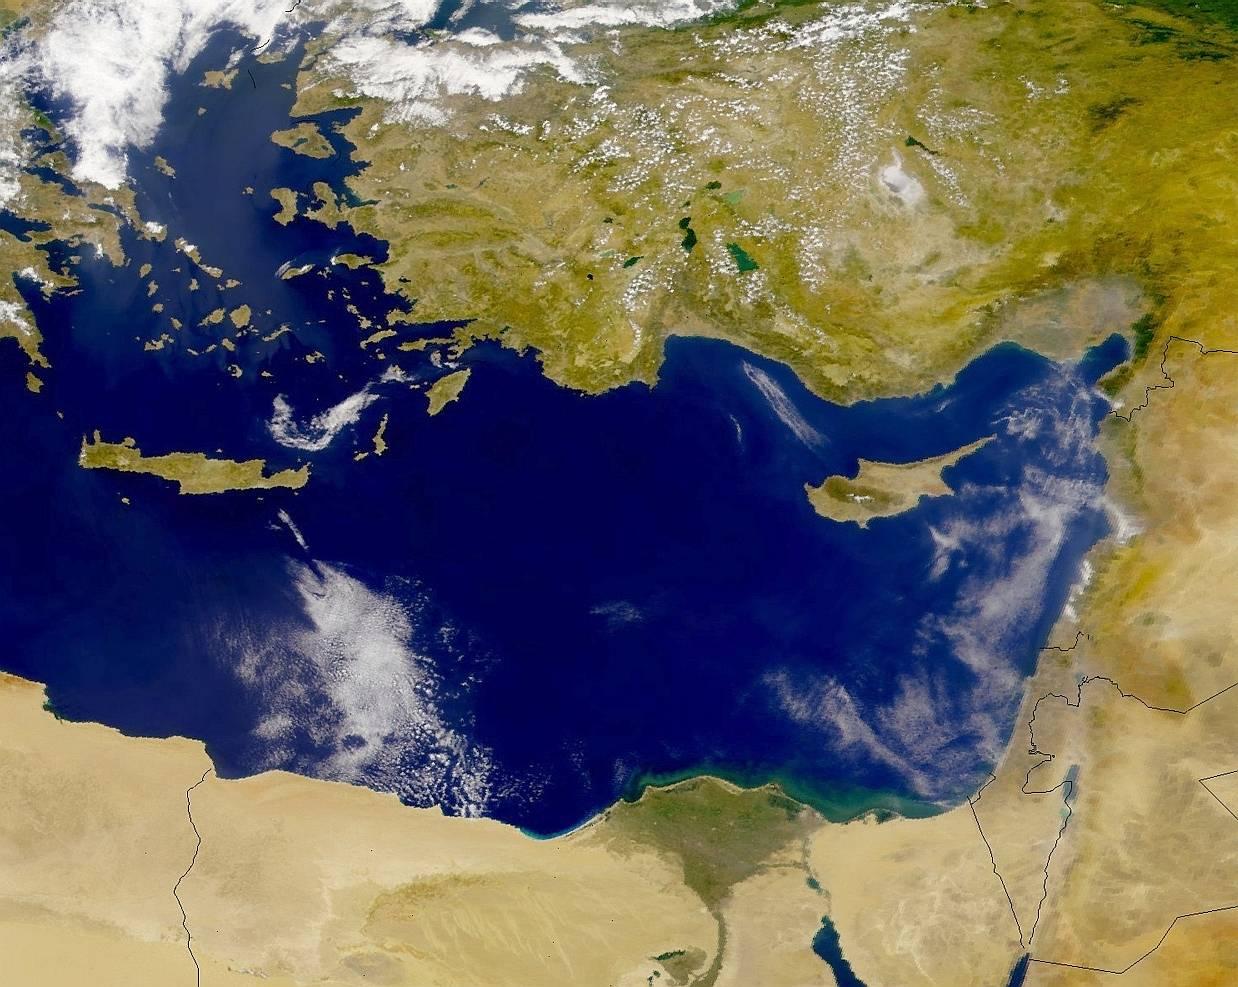 Vers un retour de la marine russe en Méditerrannée Terre-mediterranee-est-27jun00